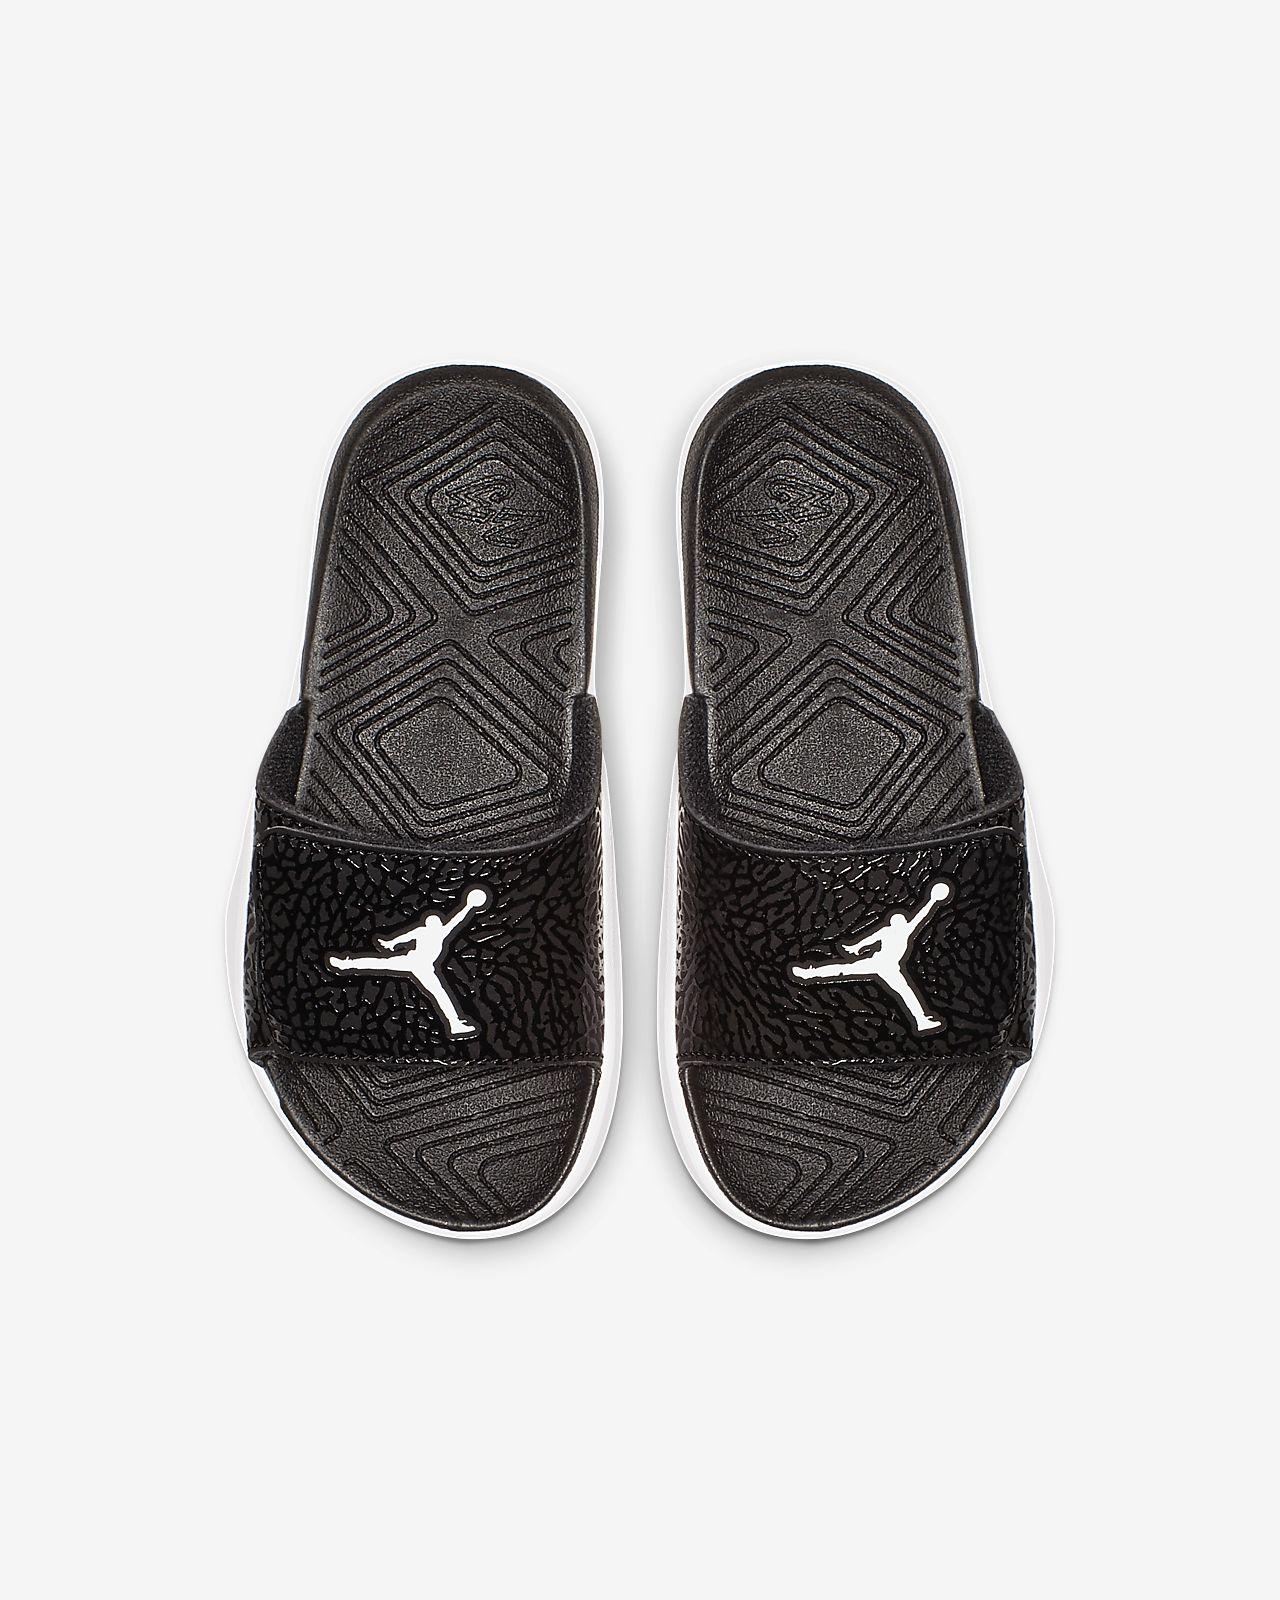 0d5eccd5f6498c Jordan Hydro 7 V2 Little Kids  Slide. Nike.com